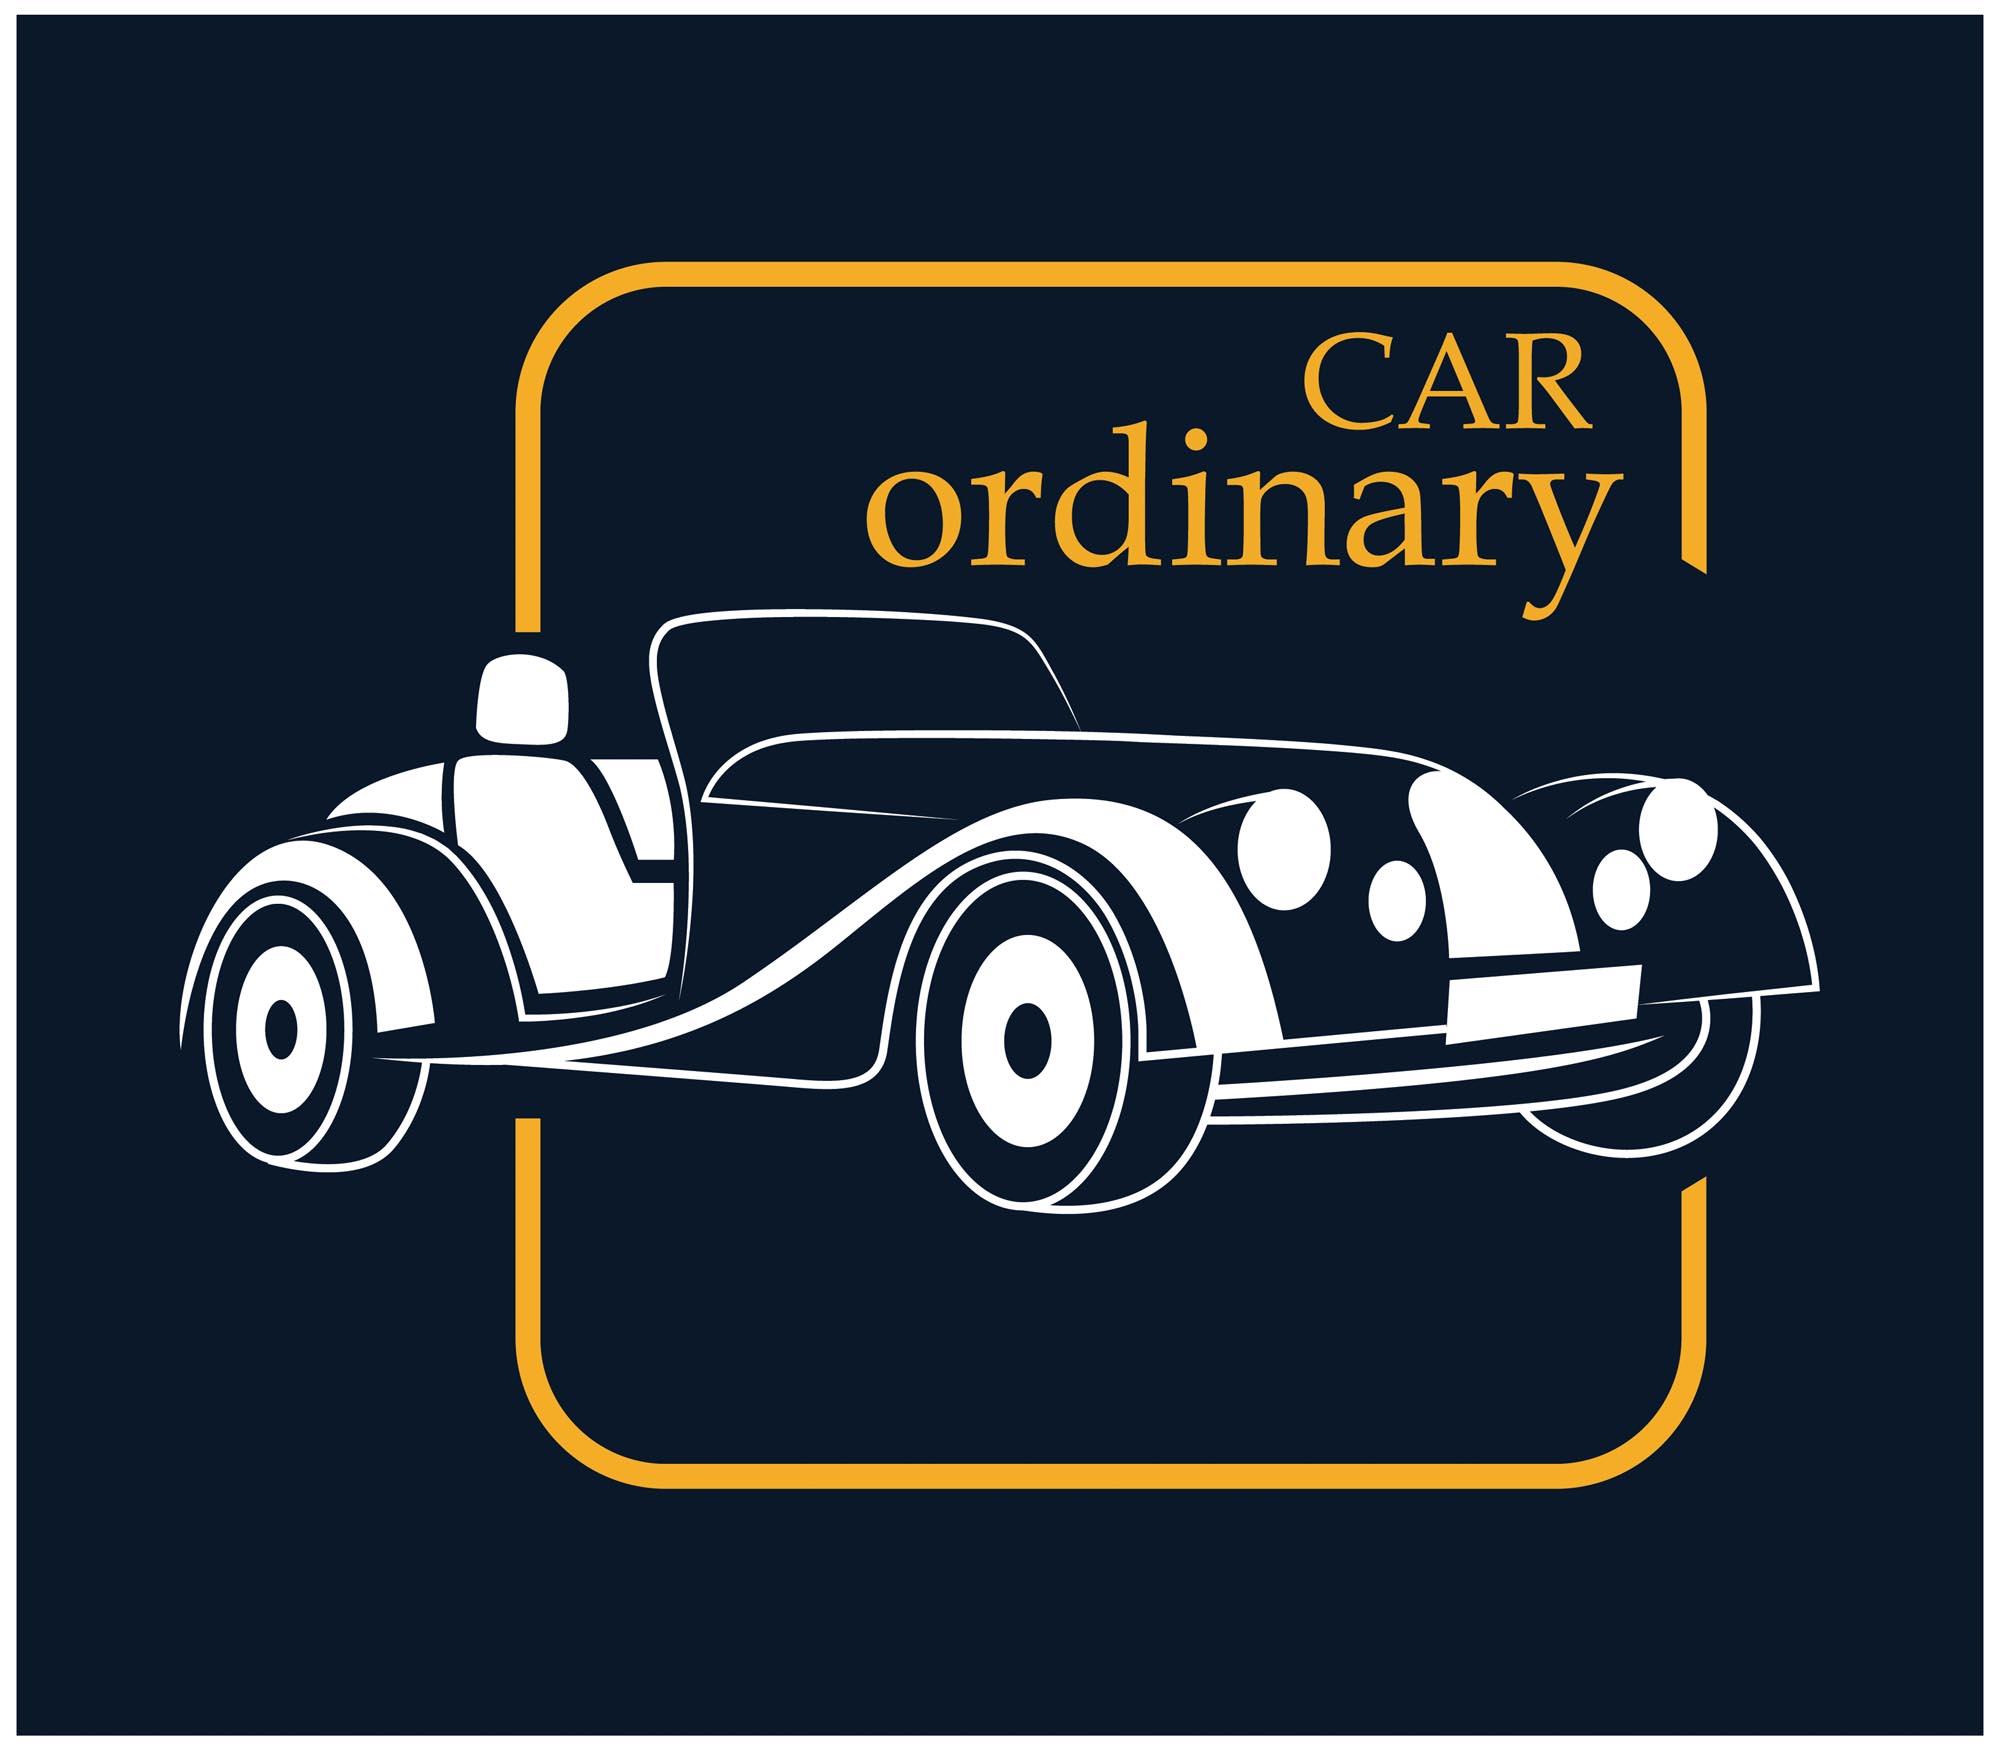 car-ordinary-logo